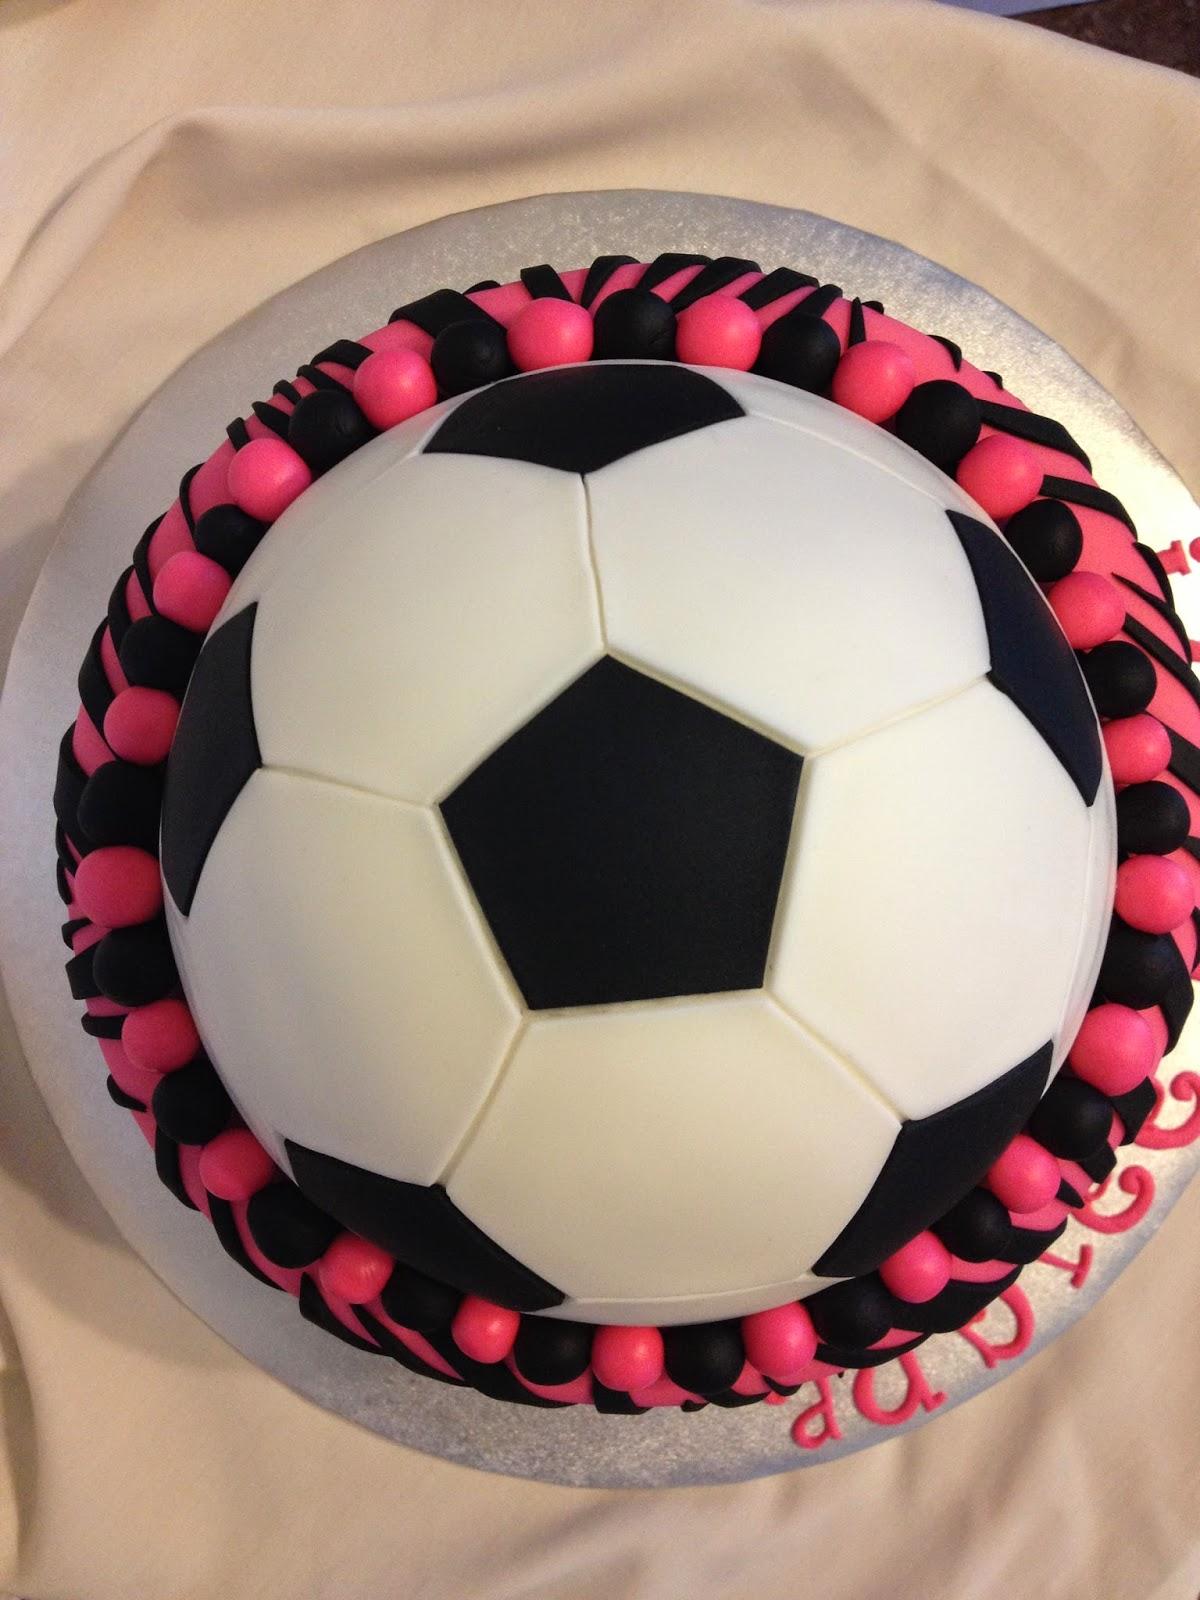 Sugar Love Cake Design: Silly boys! Soccer is for girls!